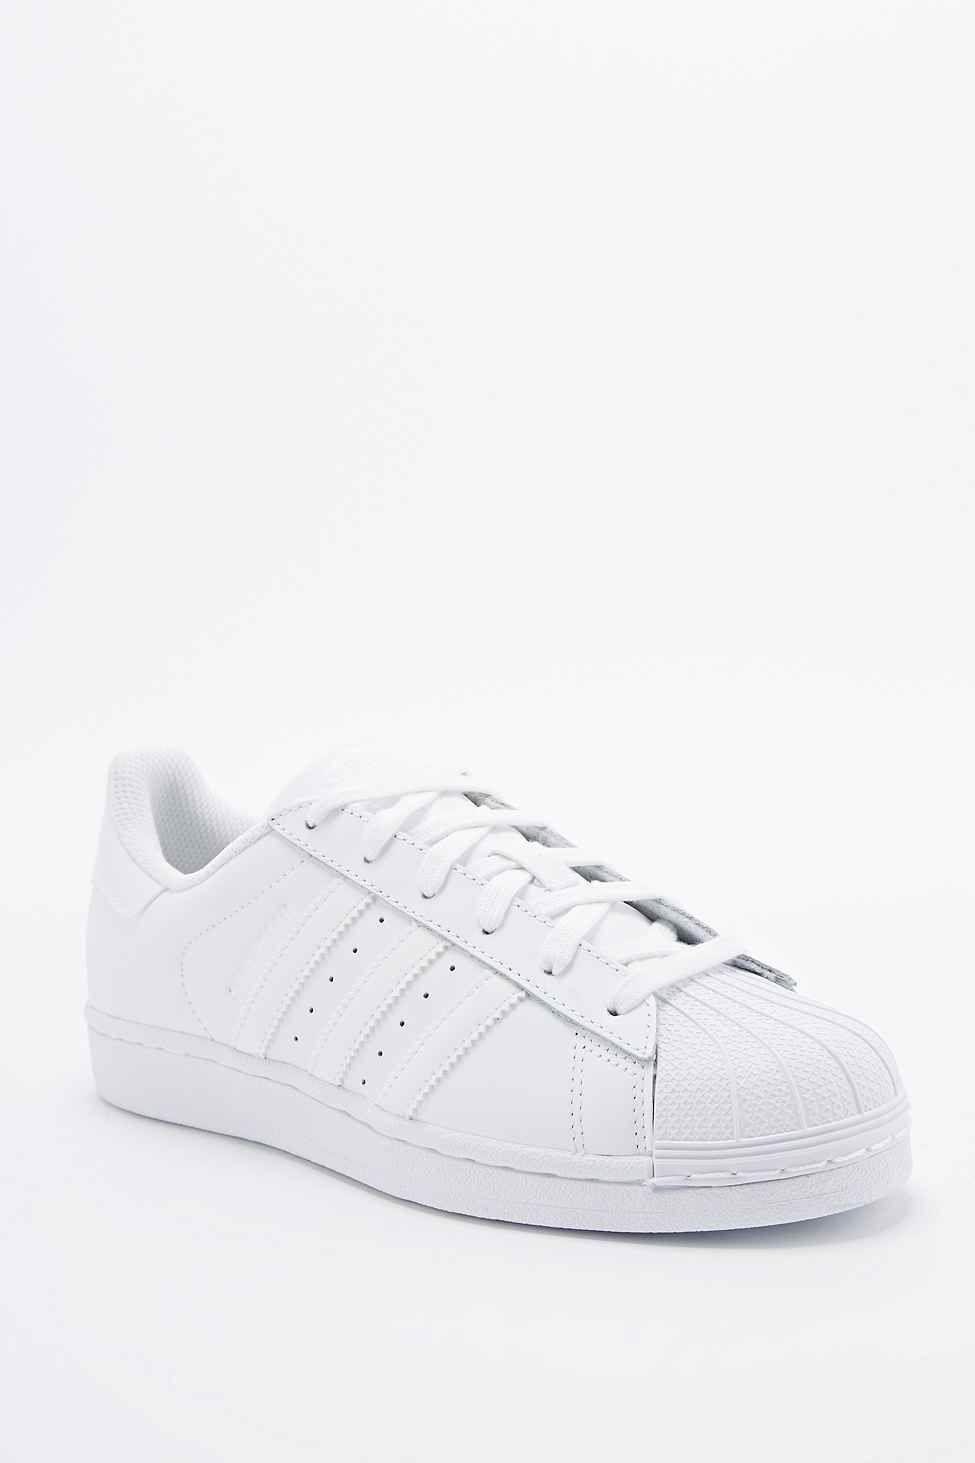 Adidas Originals Superstar 80s All White Trainers Adidas Superstar Weiss Adidas Superstar Sportmode